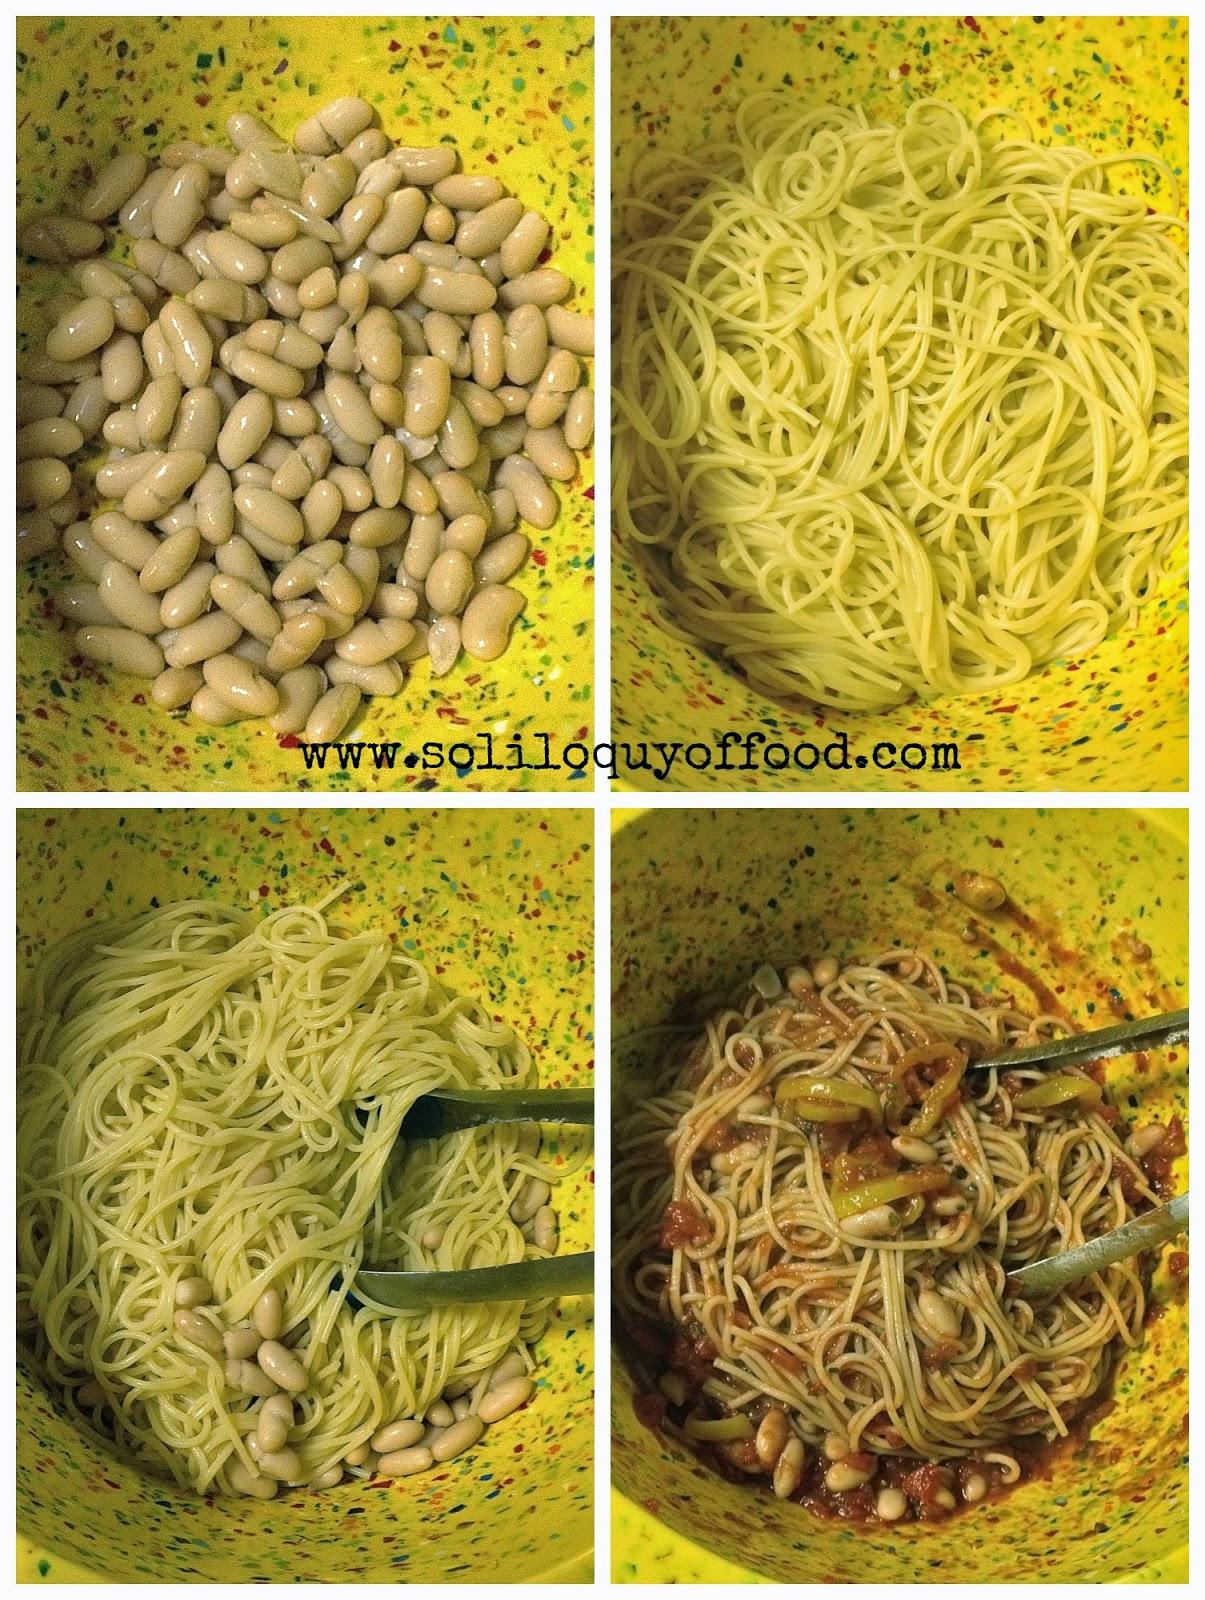 Spaghetti and Cannellini Marinara Alla Momma - zingy banana peppers are the alla momma portion - www.soliloquyoffood.com